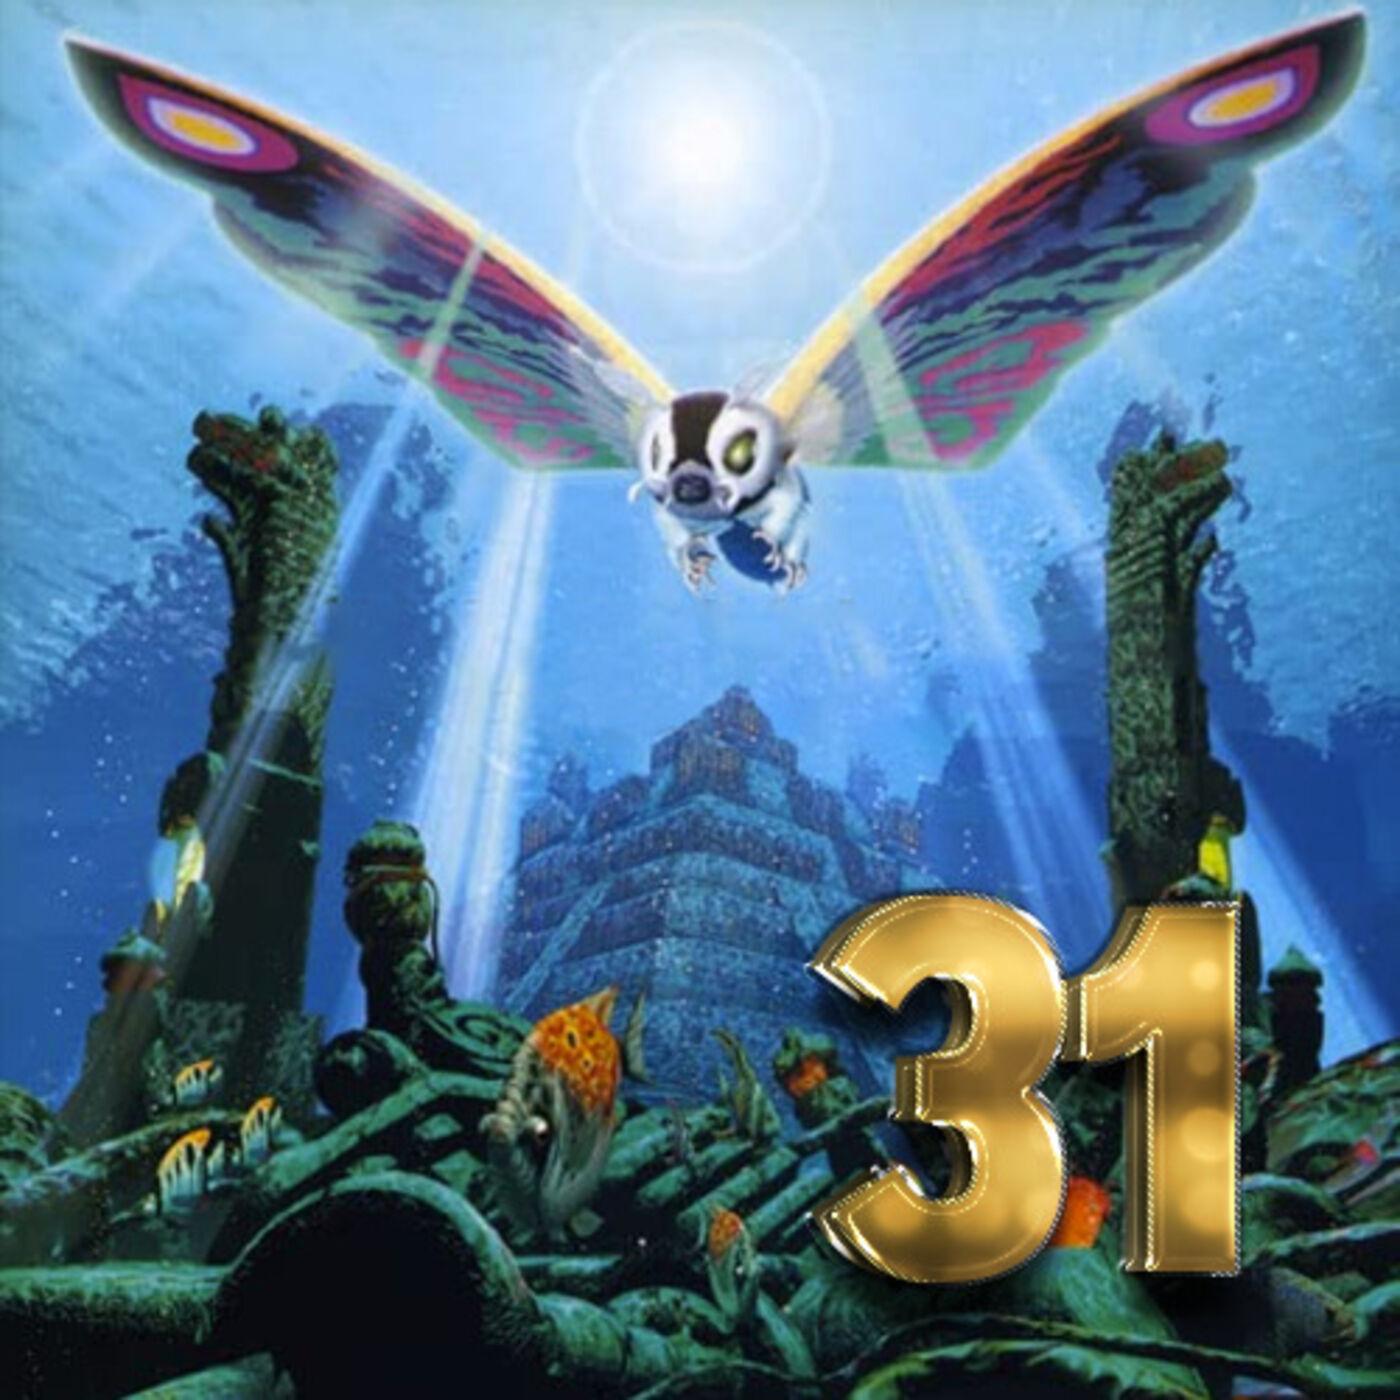 Ep 31 - Alright, I Guess! (Rebirth of Mothra II)